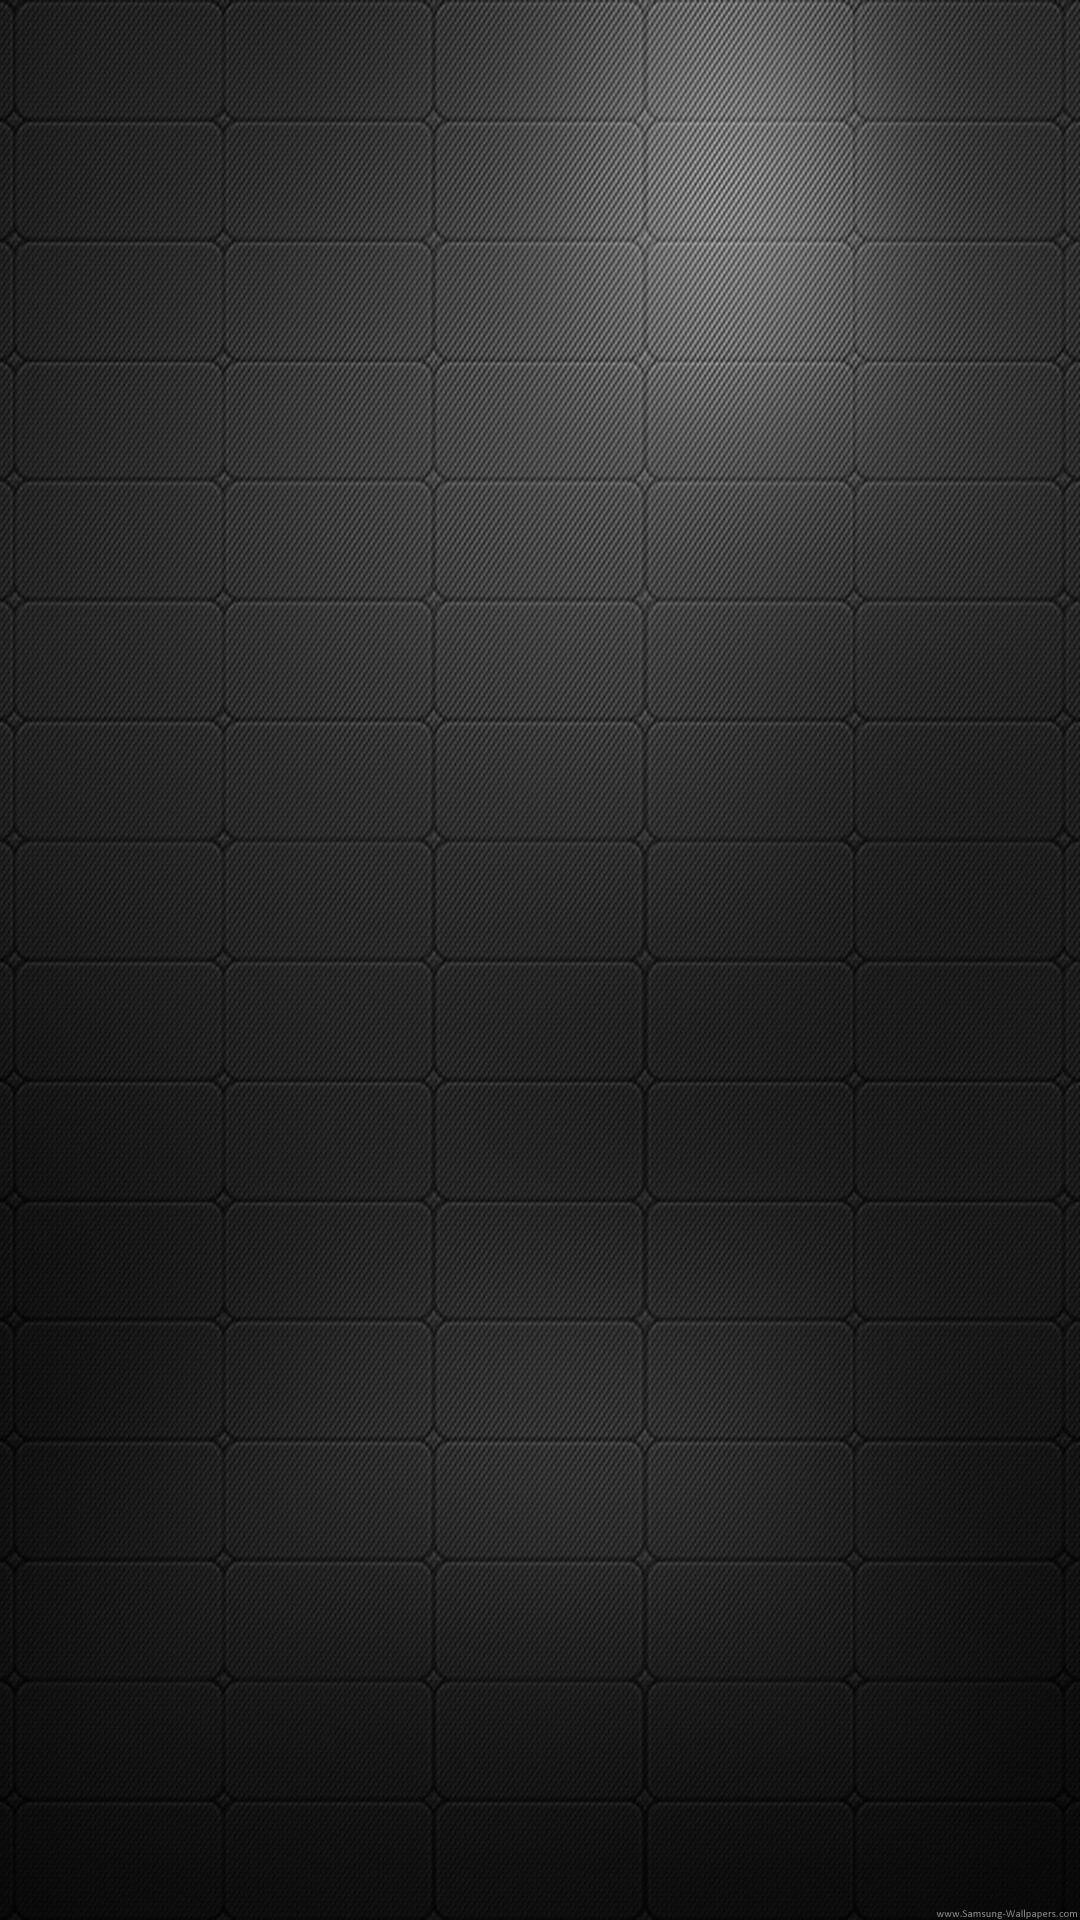 Black Screen Wallpaper (70+ Images